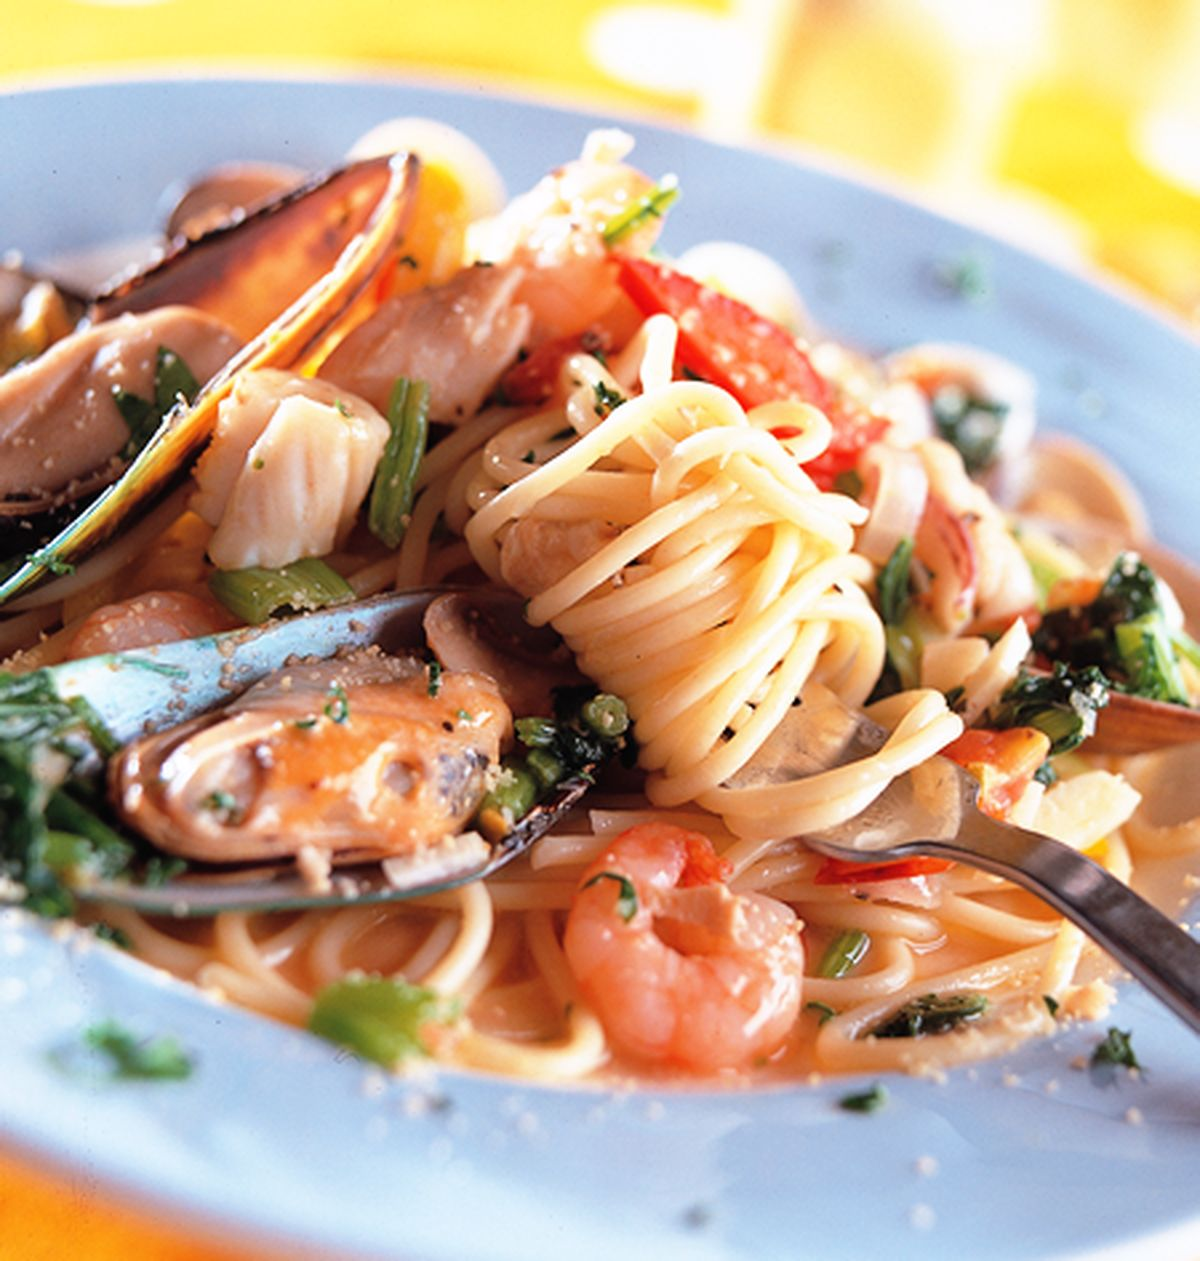 食譜:海鮮冷麵